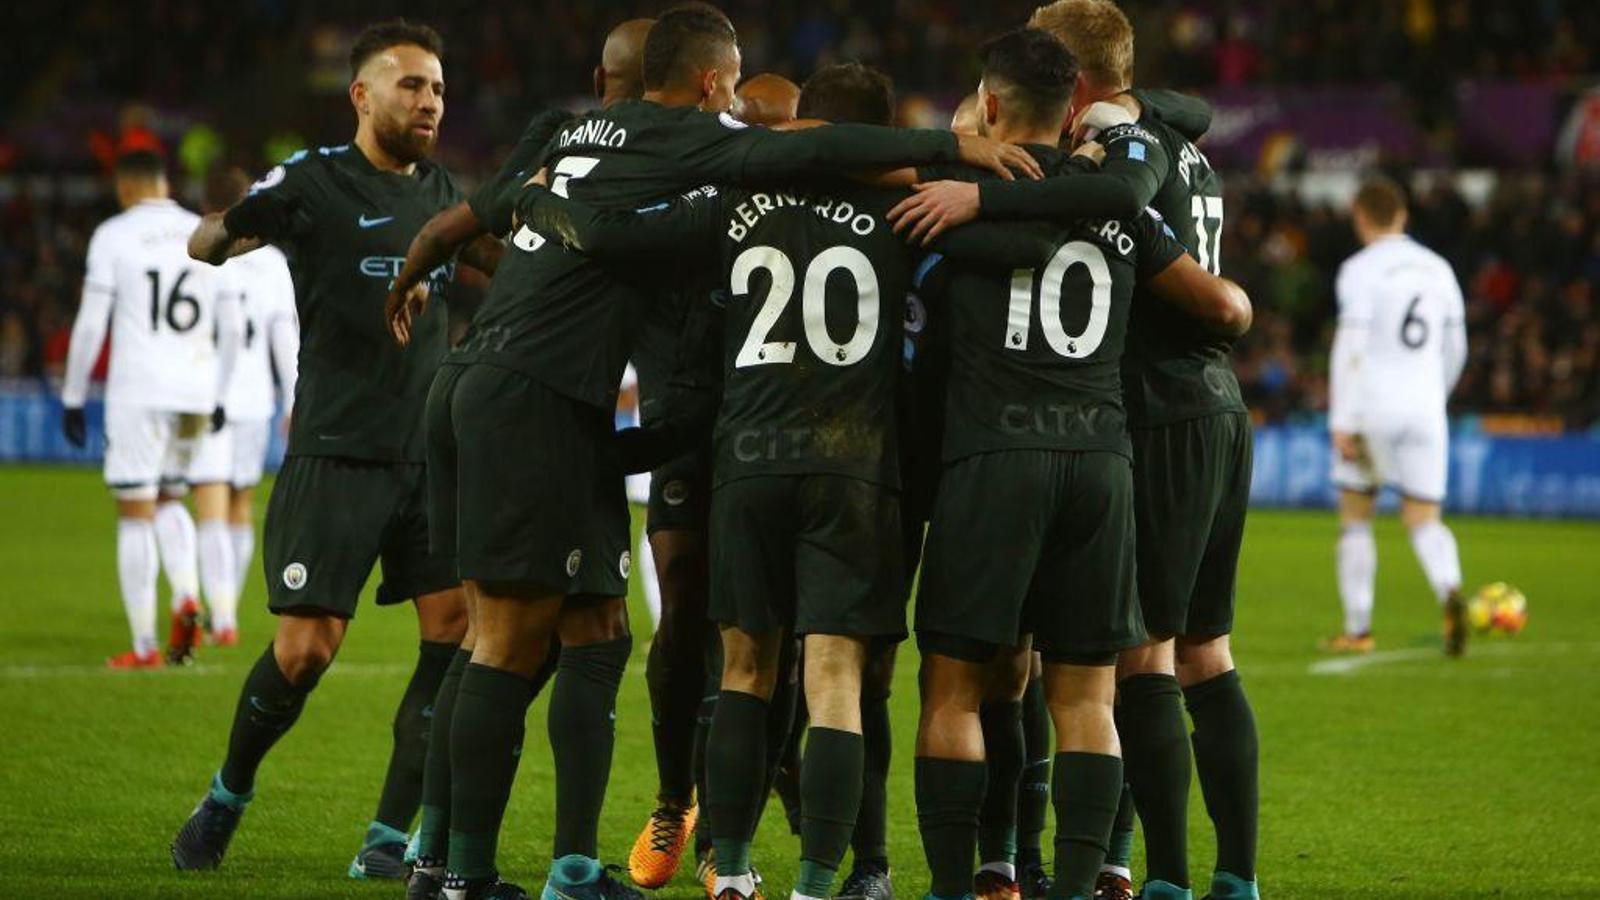 El City no ha fallat al camp del Swansea